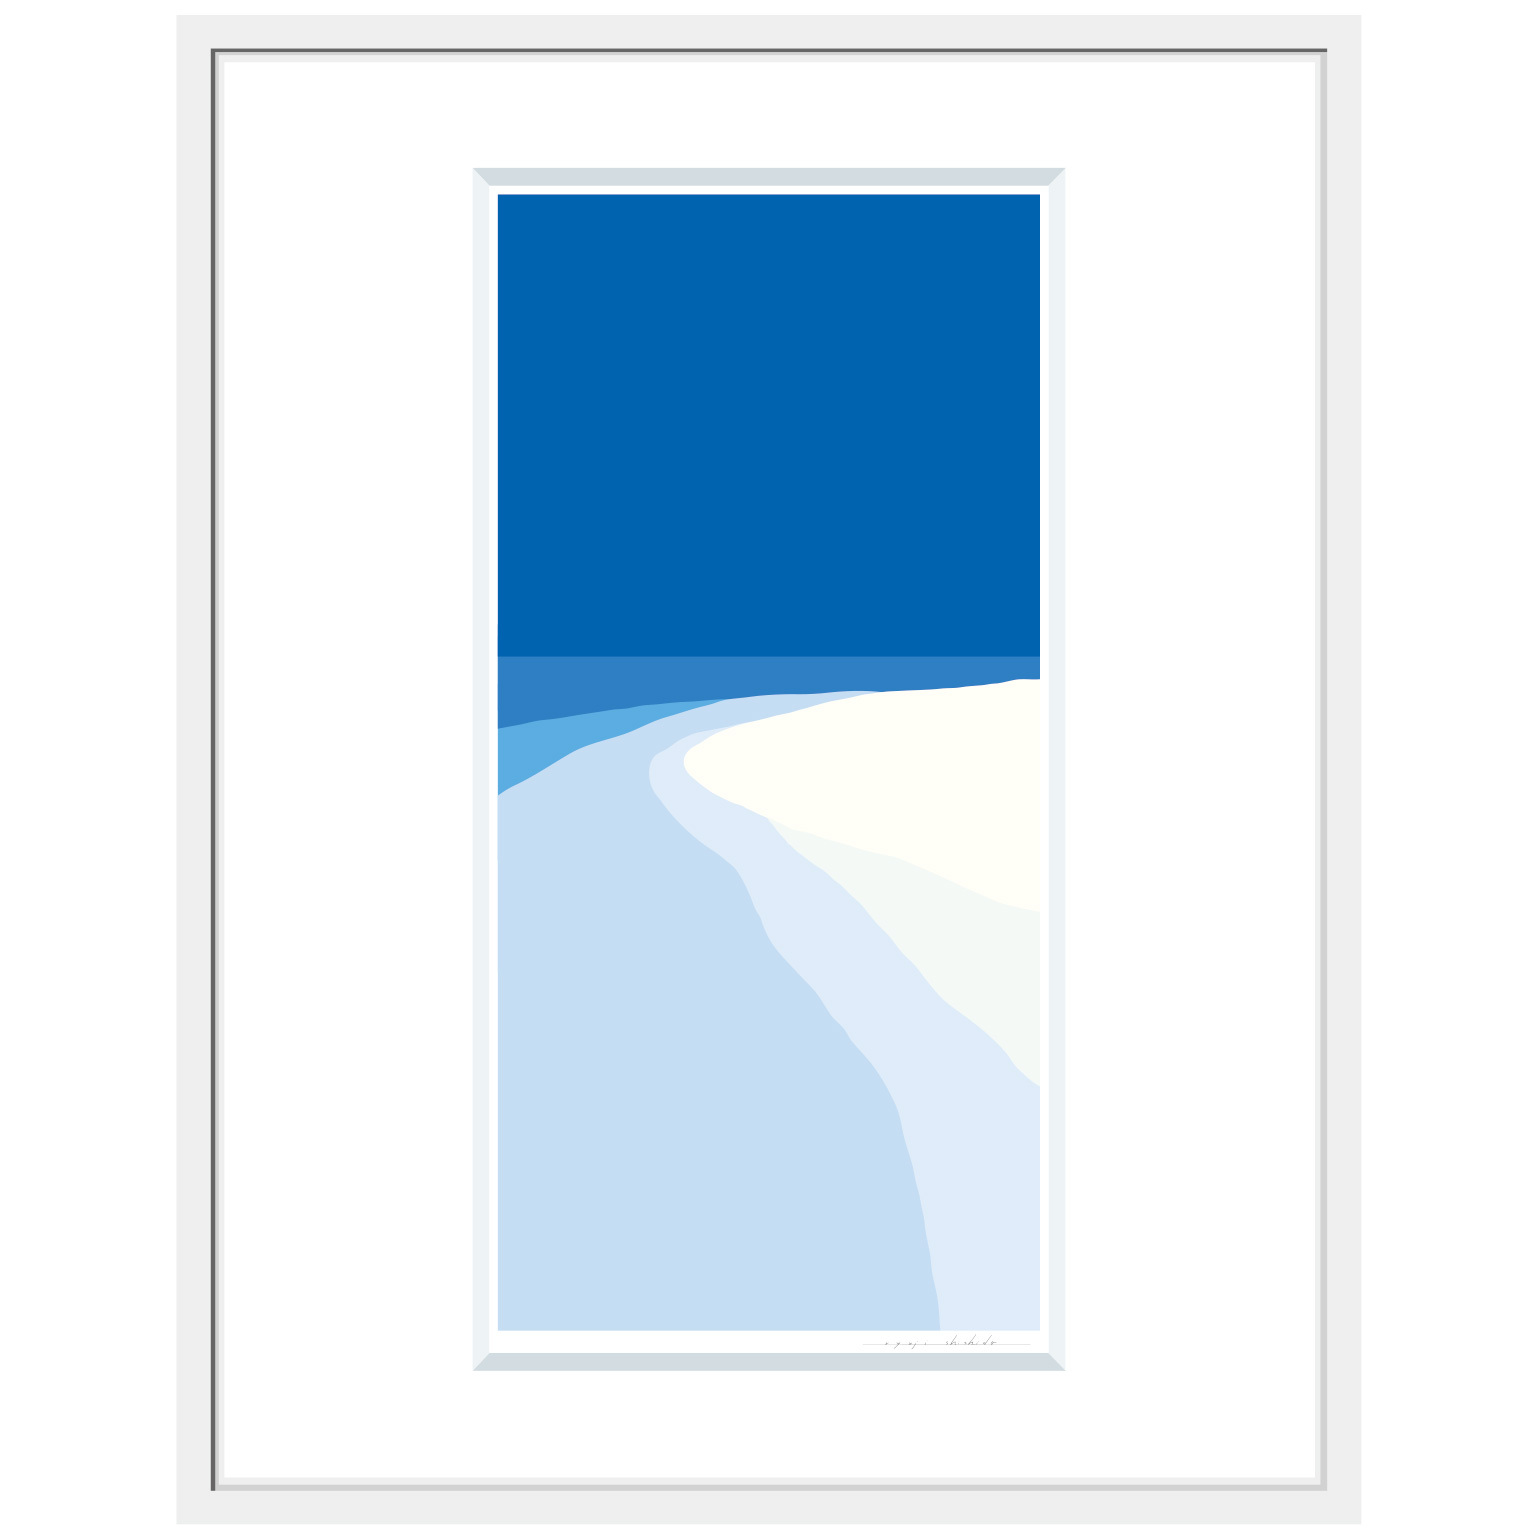 No.La-006「海の音」ジクレープリント額装 L size